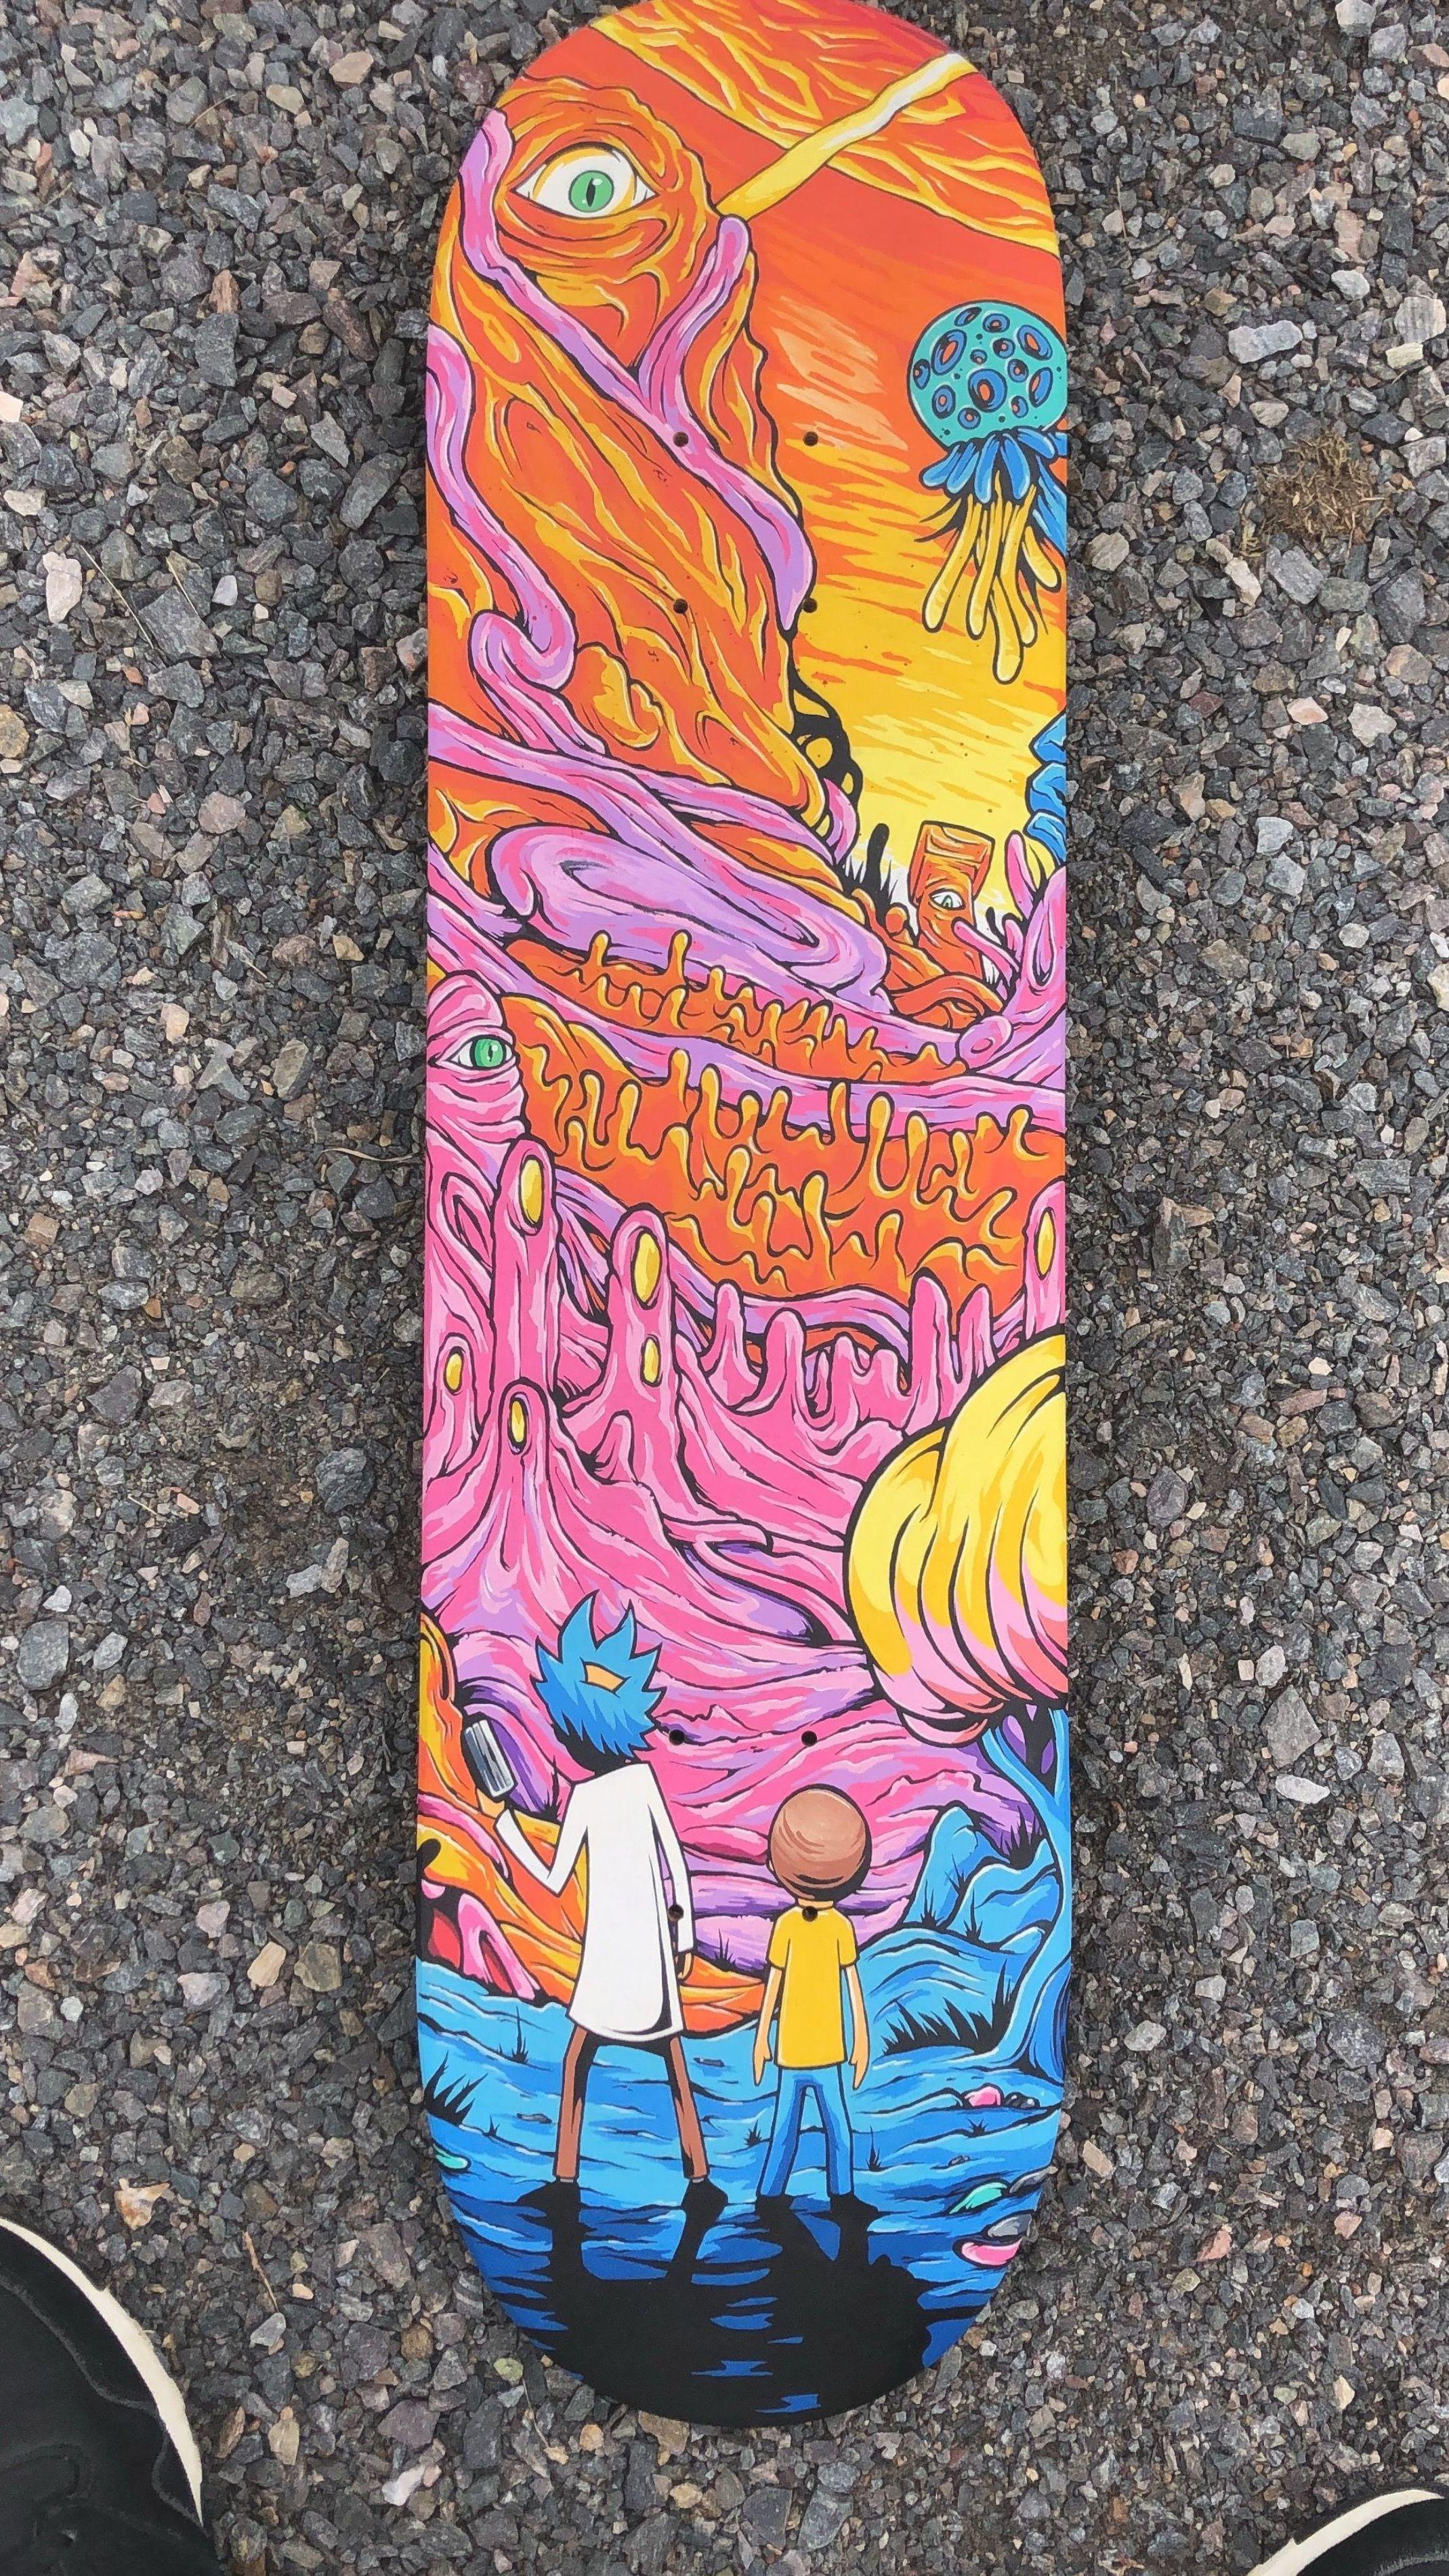 Custom Skateboard I Made Months Ago Rickandmorty Rick Picklerick Morty Wubbalubbadubdub Ge In 2020 Skateboard Art Design Skateboard Deck Art Custom Skateboards